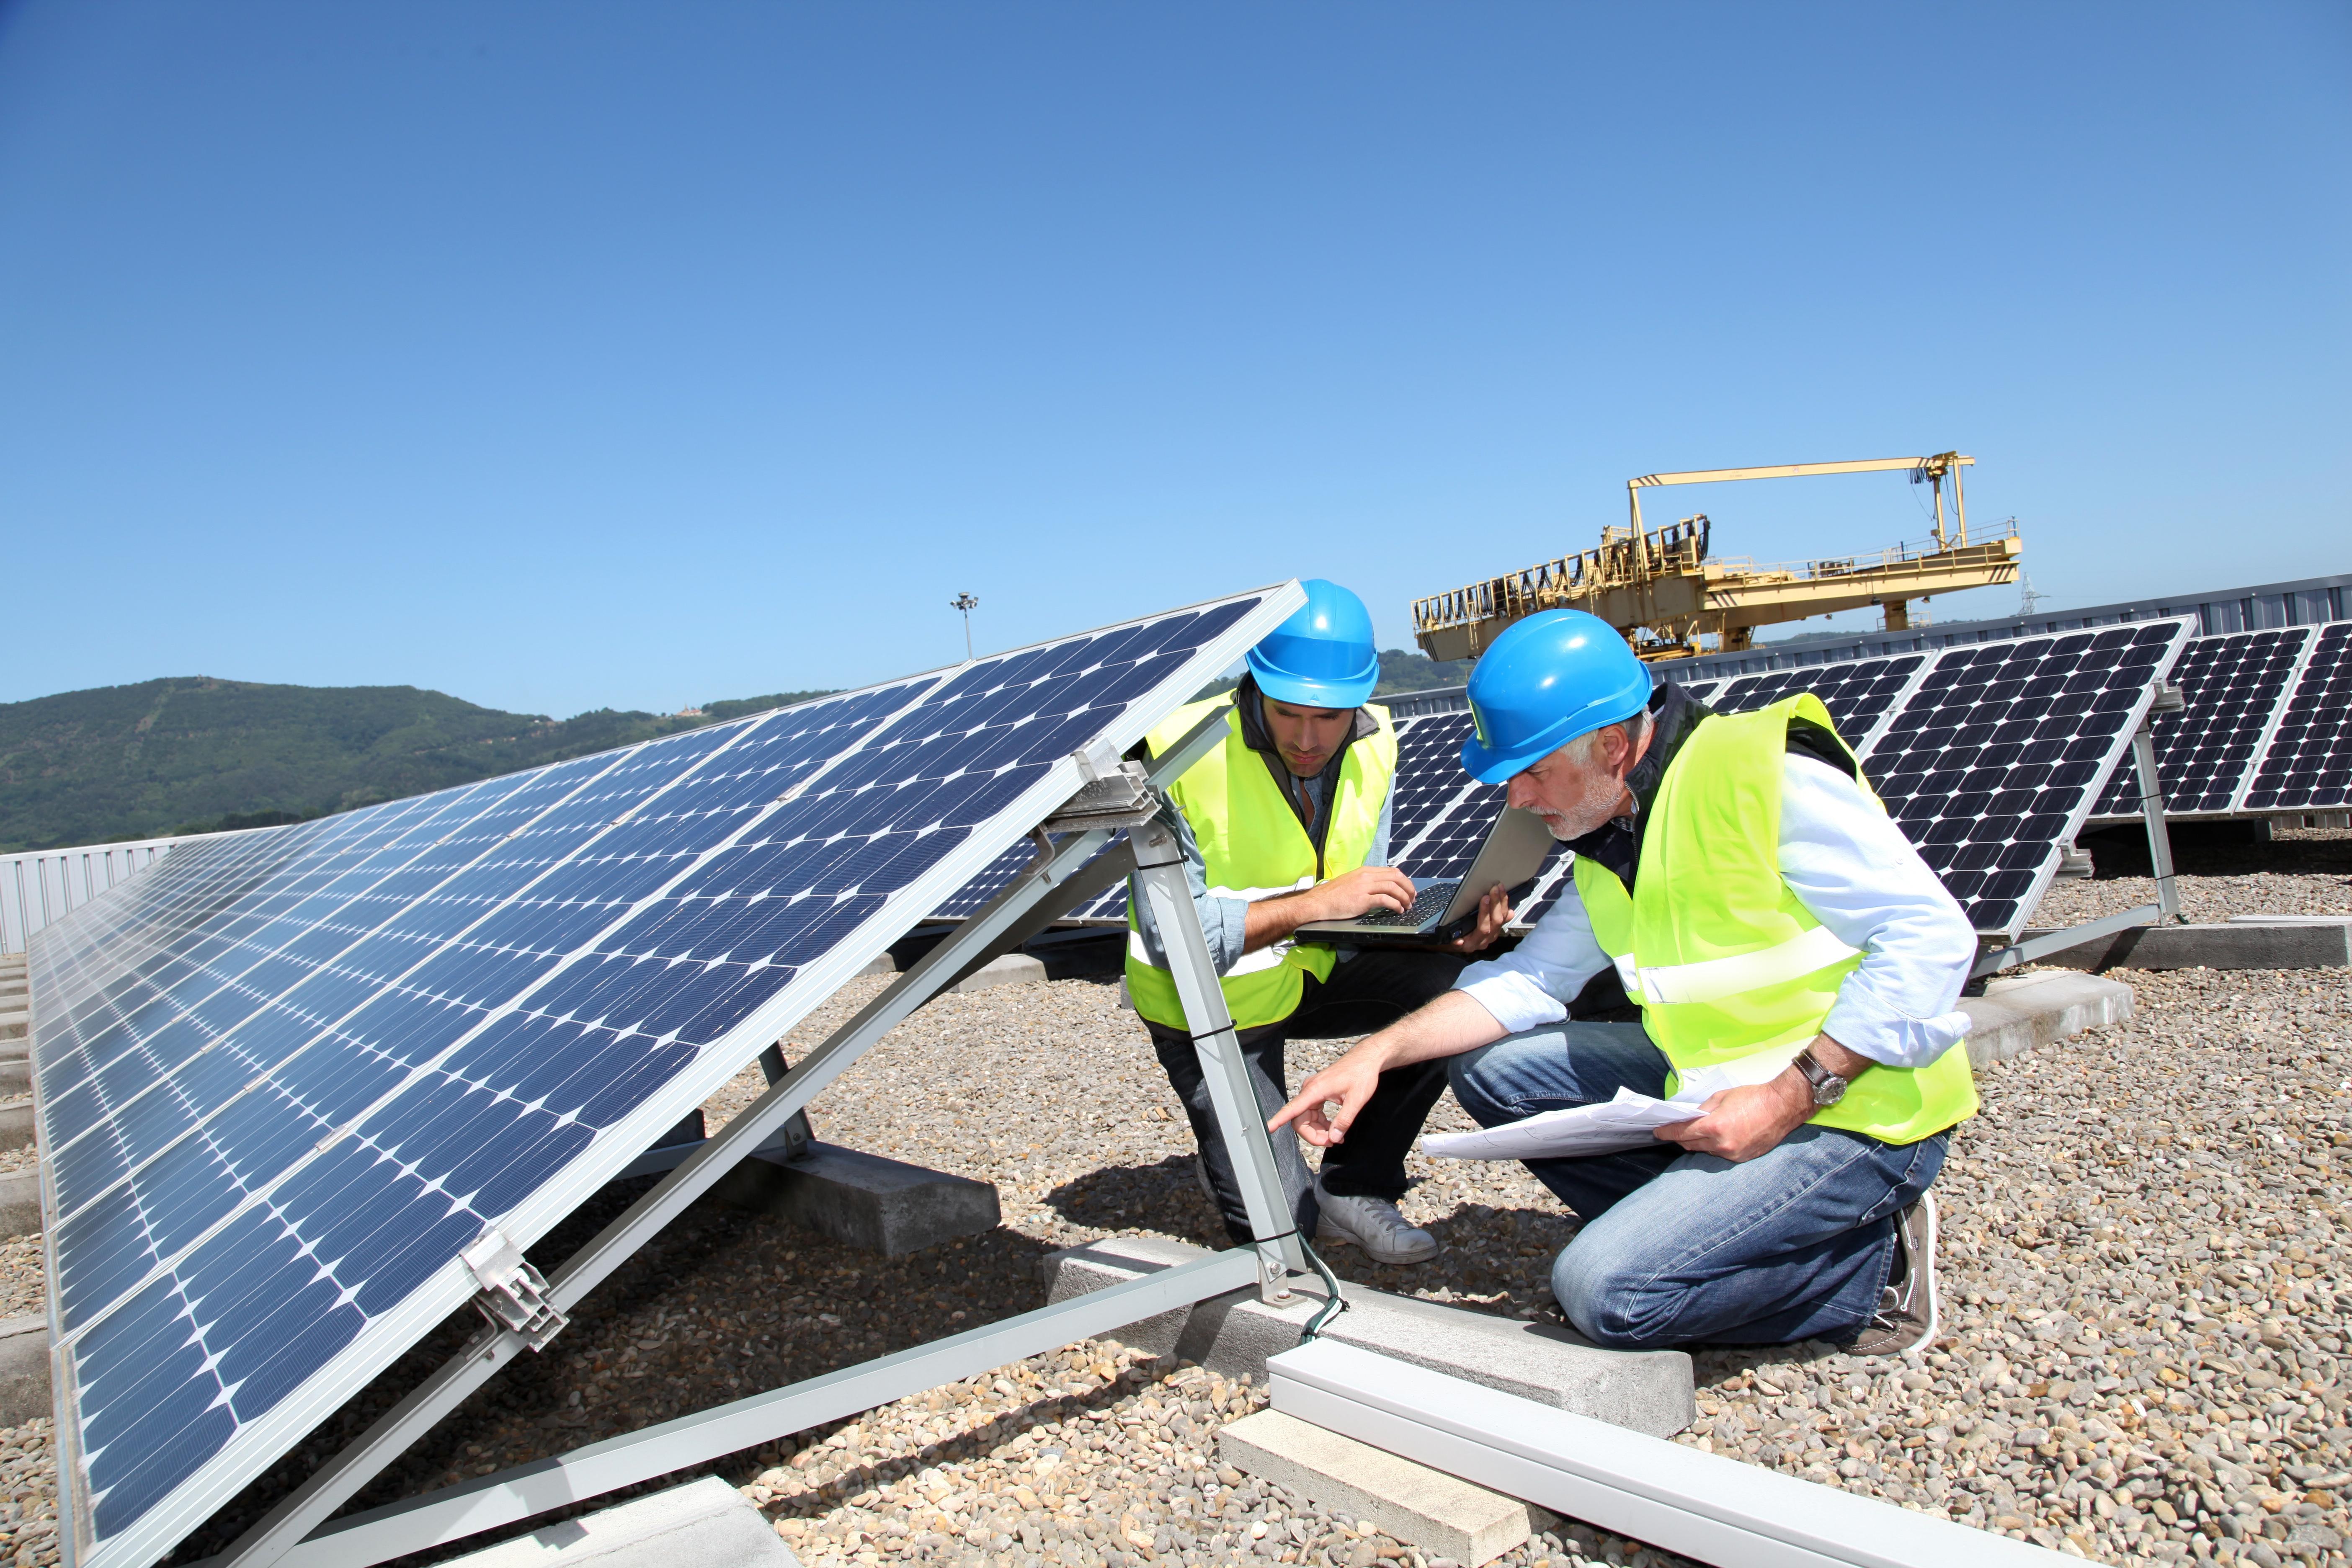 Two technicians in hard hats examining installation of solar panels ...